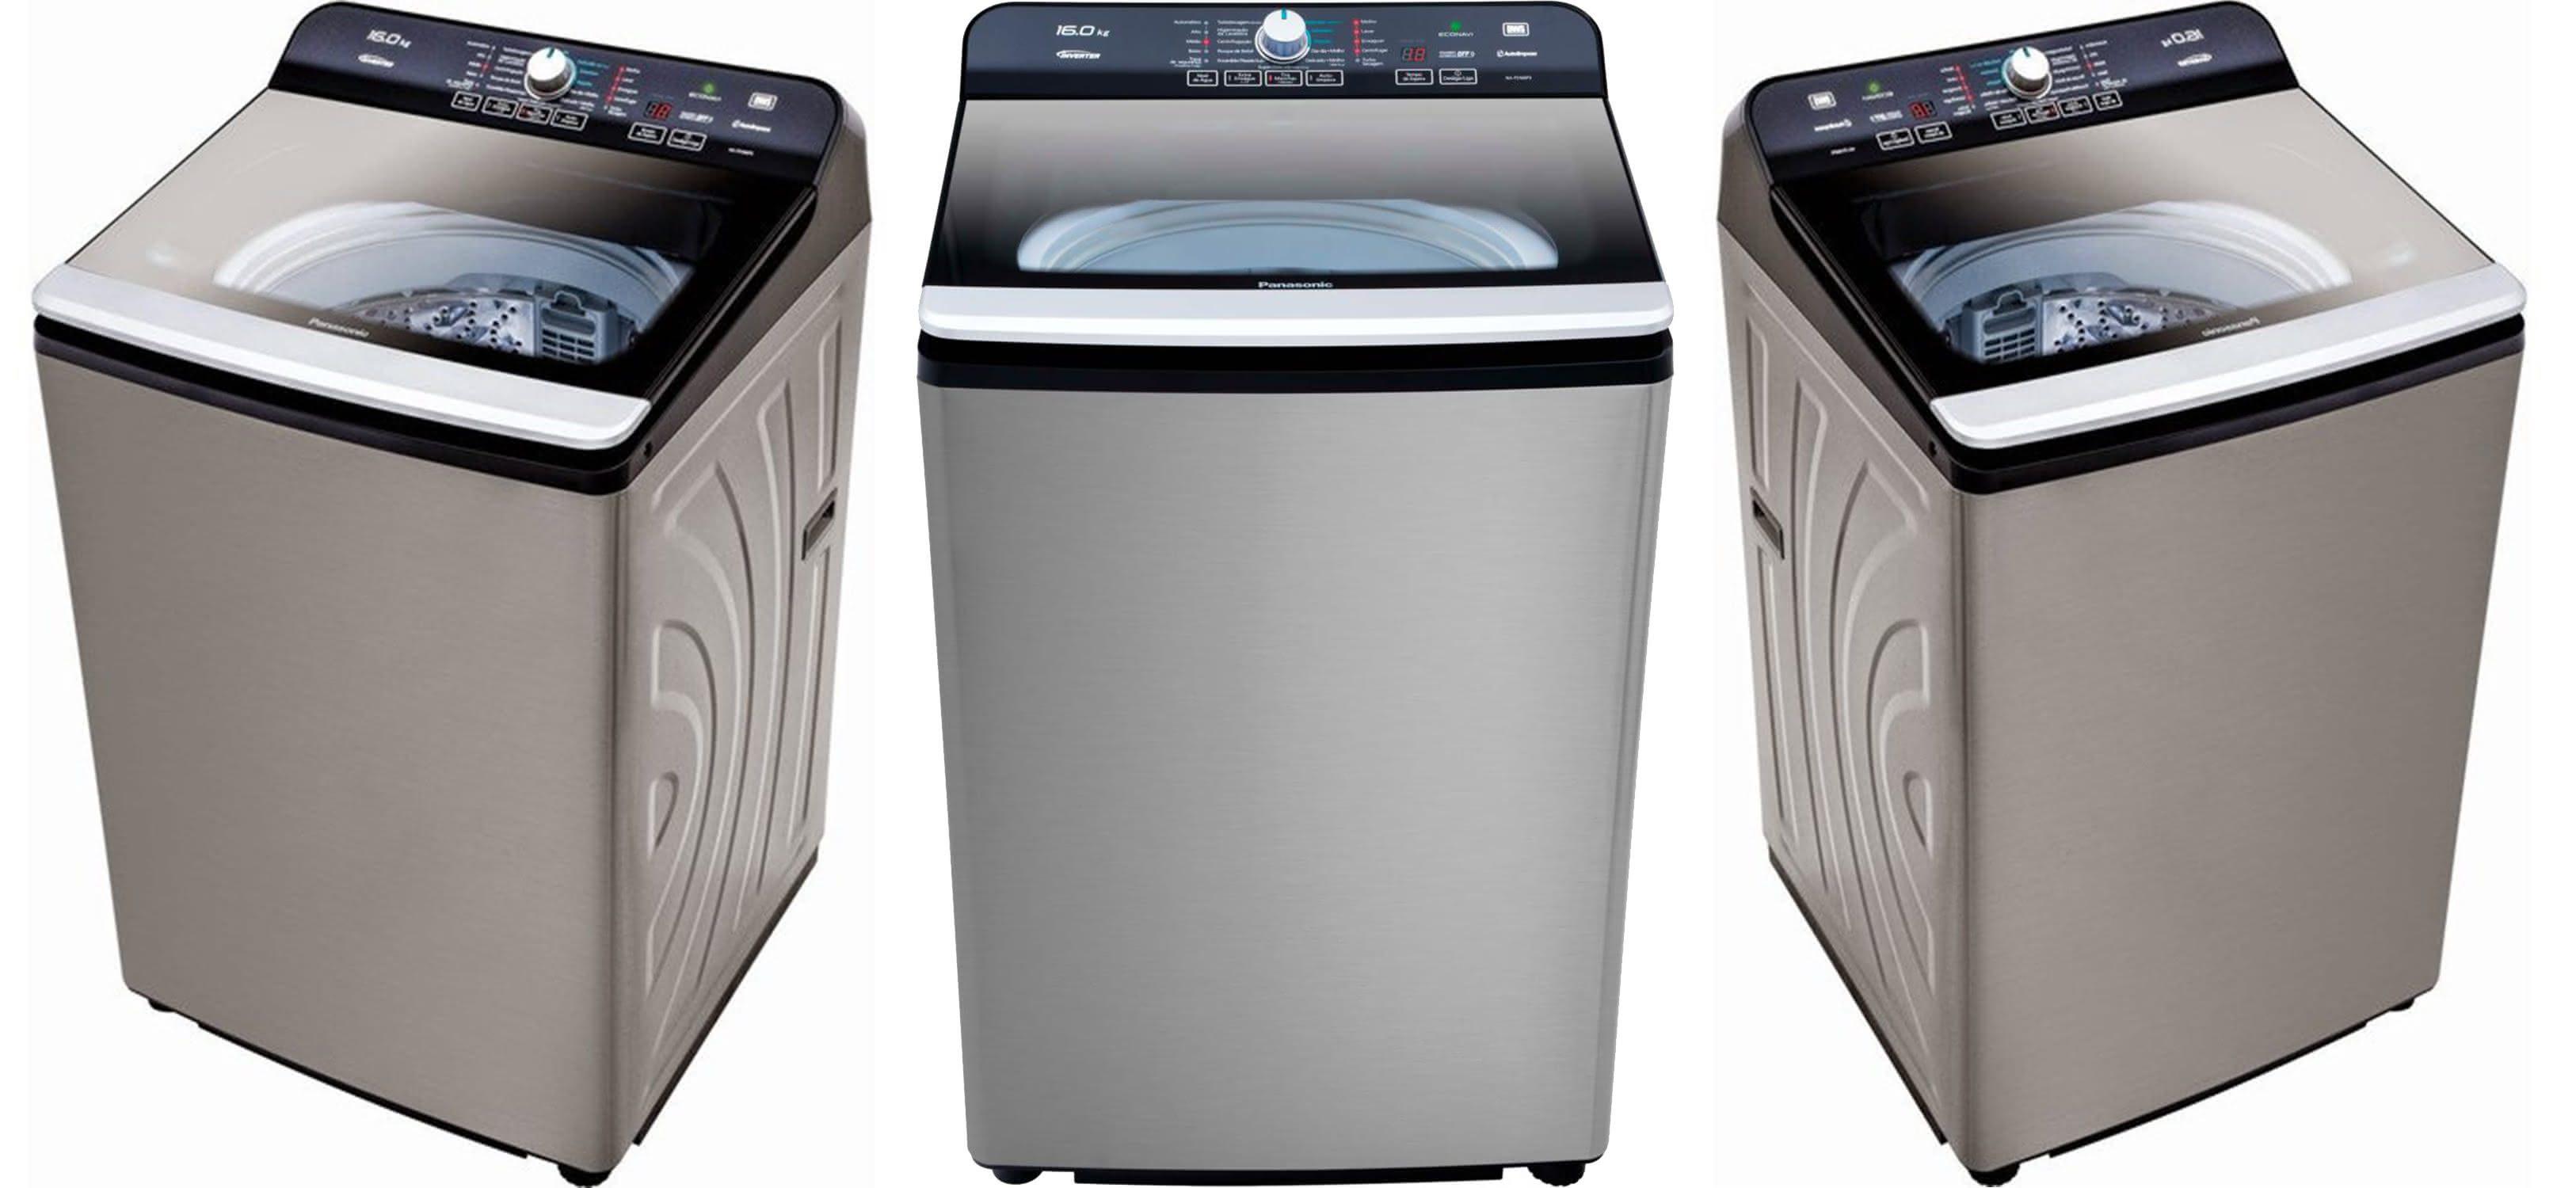 Máquina De Lavar Roupas Panasonic